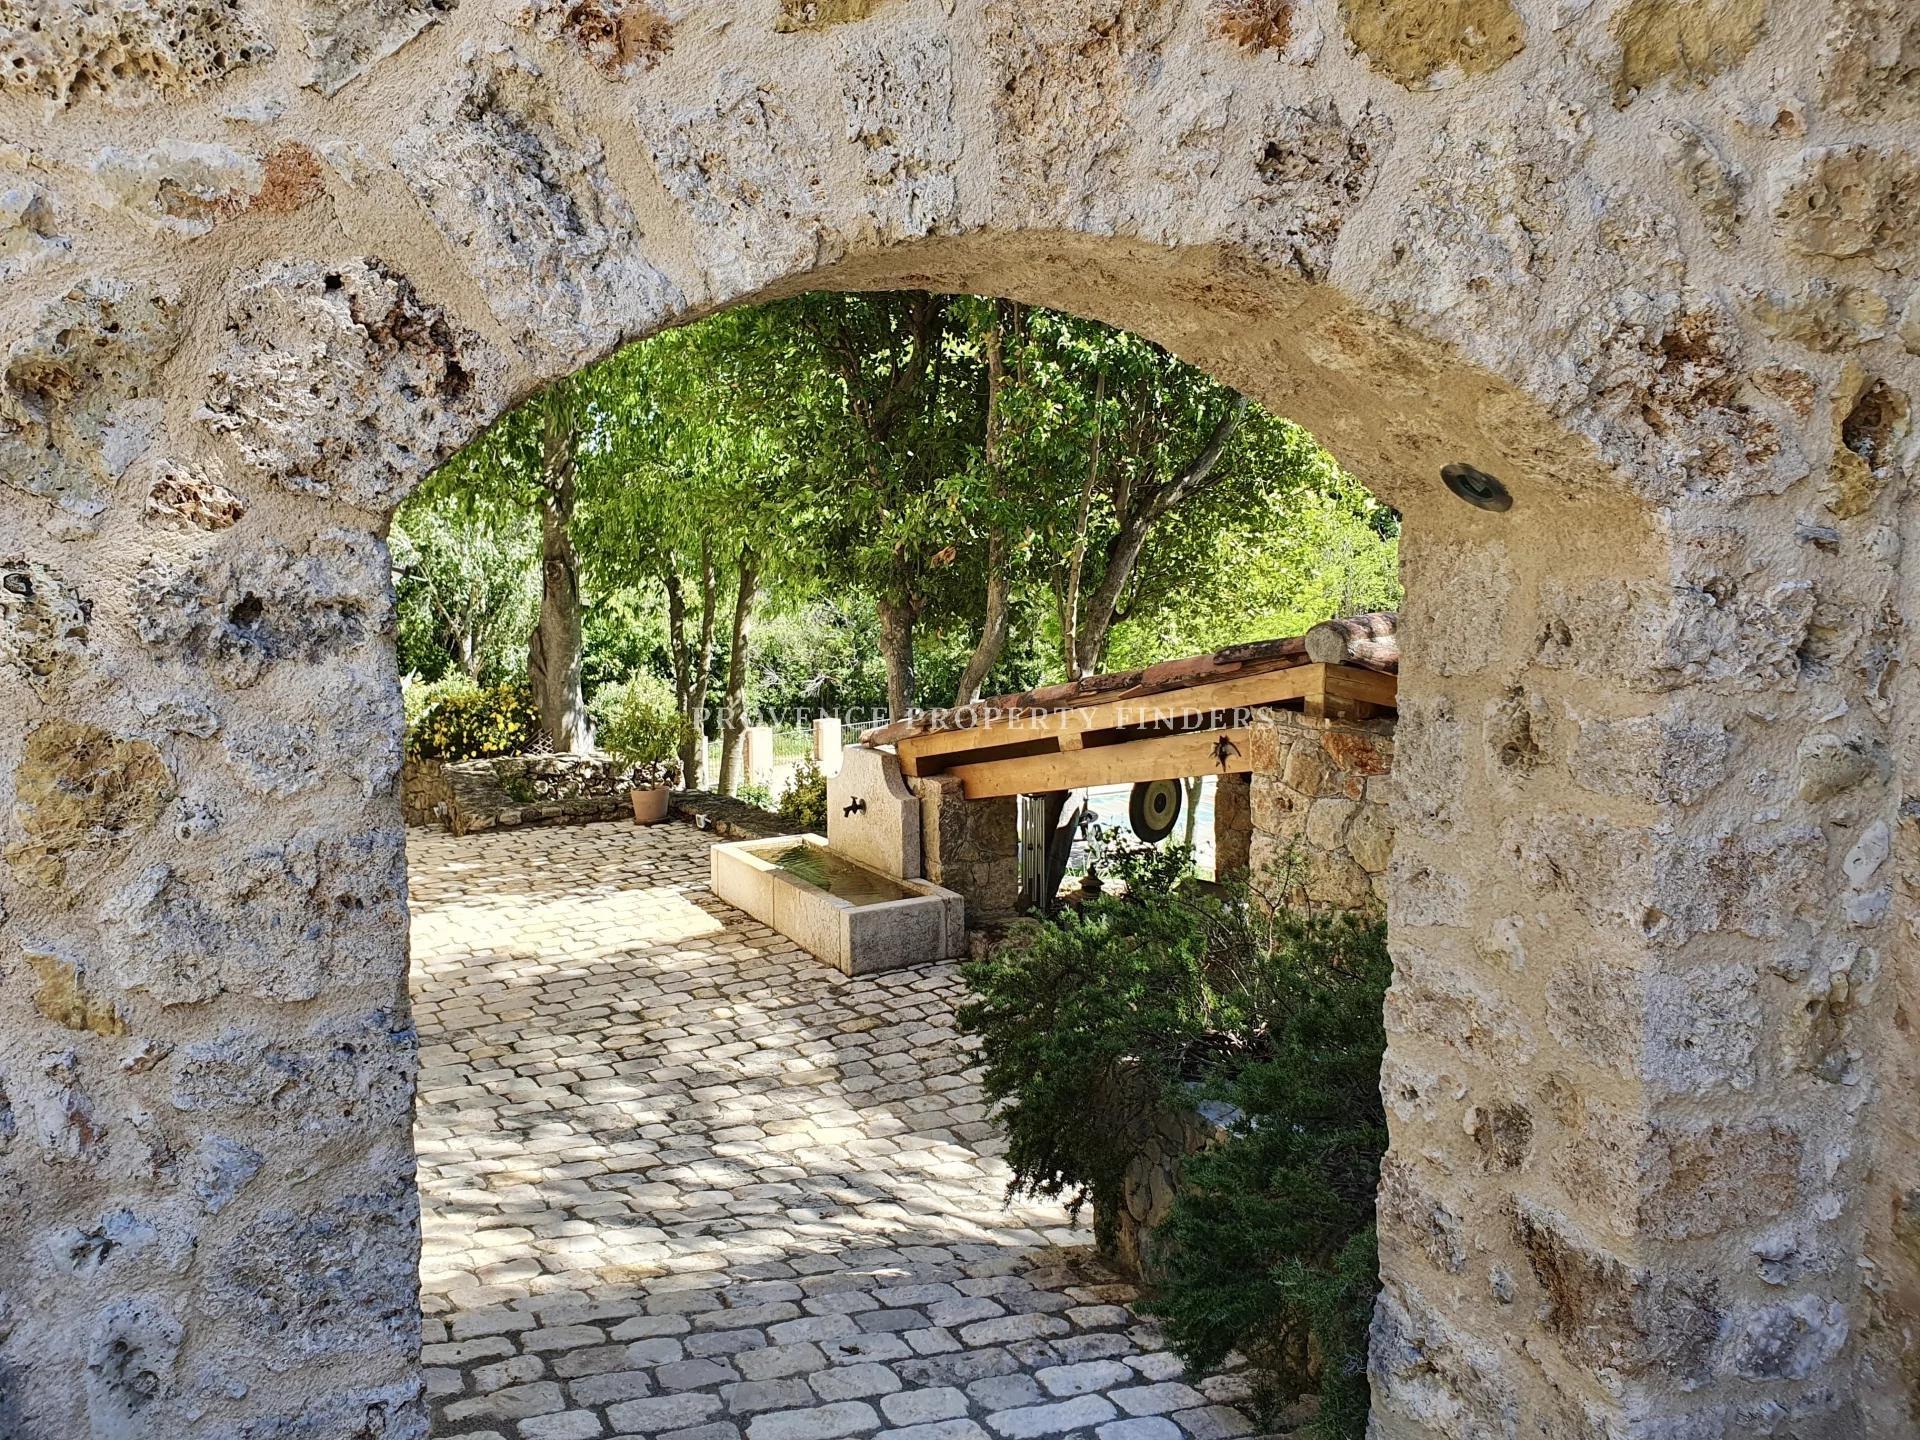 Ultimate Provence! Gerenoveerde oude bastide, 5 slaapkamers, verwarmd zwembad.